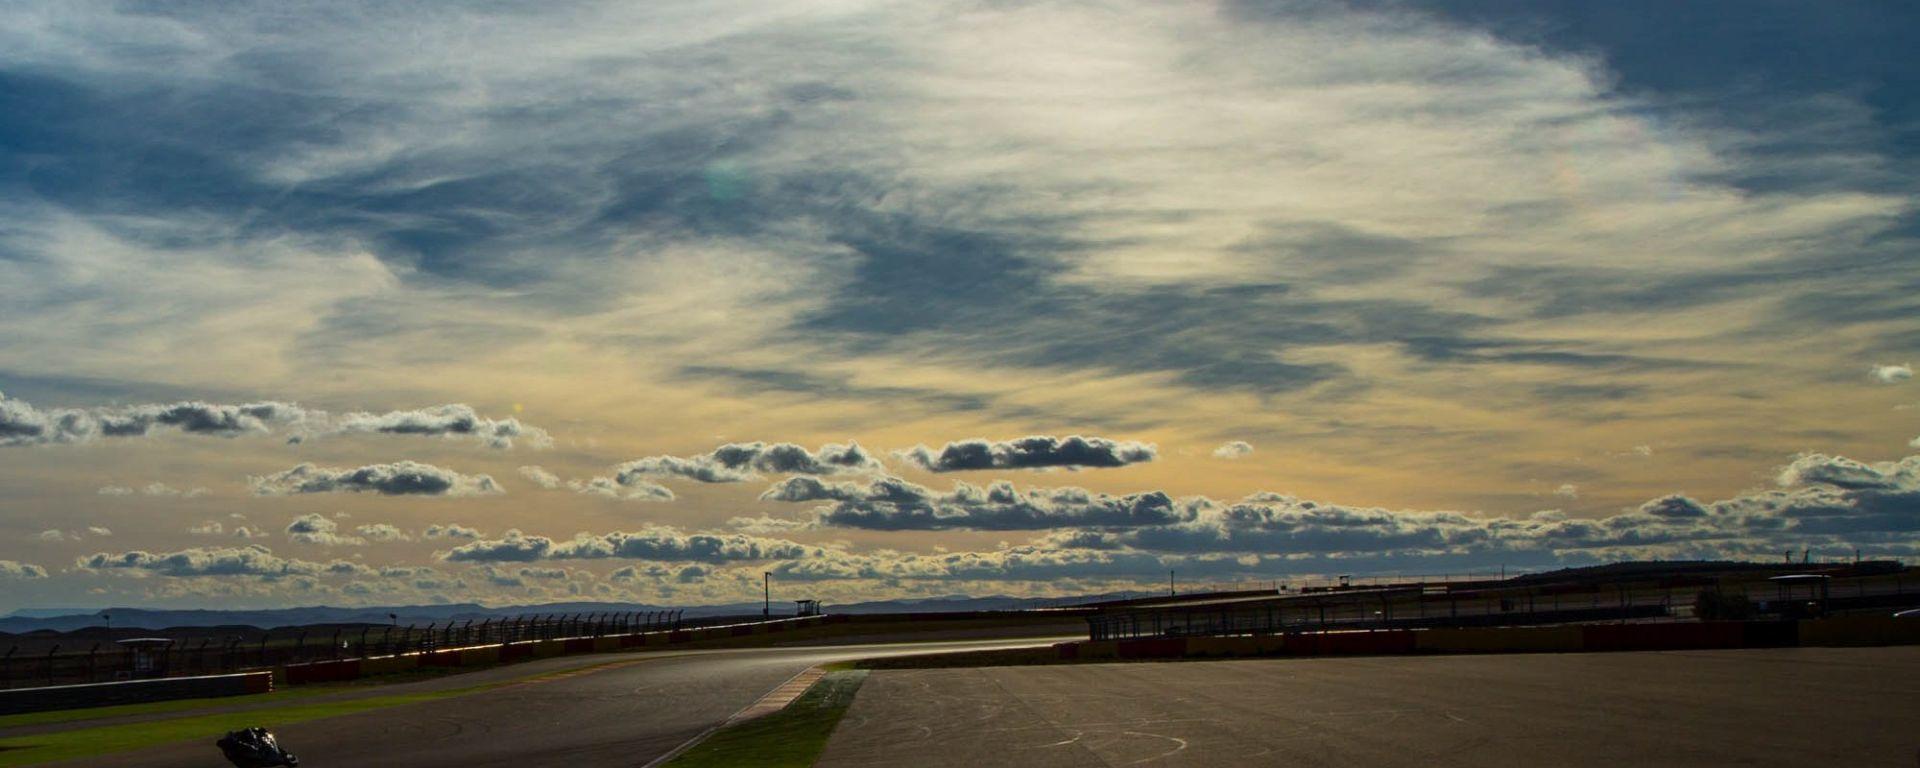 Gran Premio di Aragon Spagna Superbike: risultati Gara 1 e Gara 2